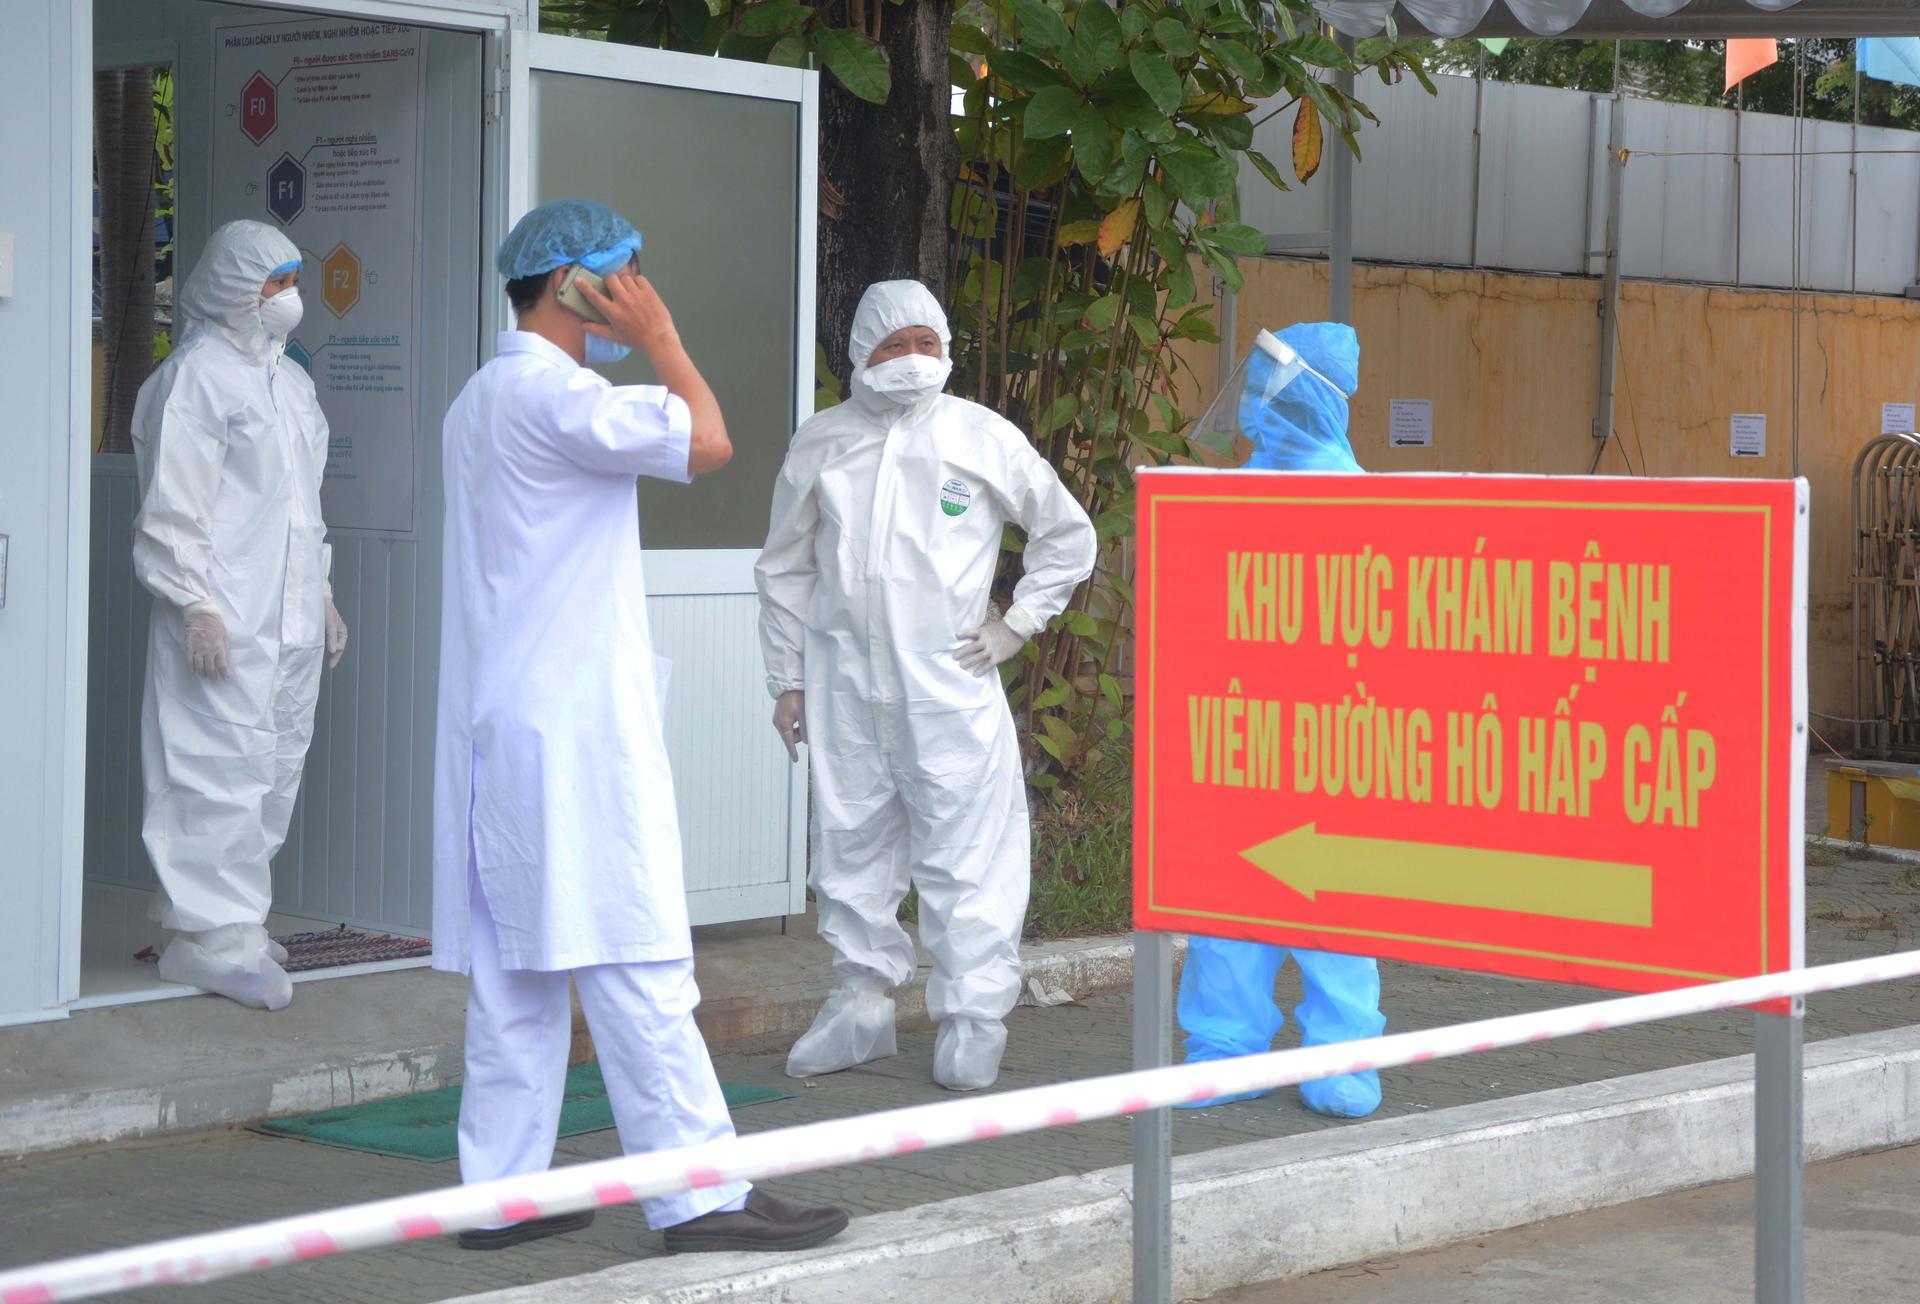 Vietnam PM says next 10 days 'critical' in virus fight